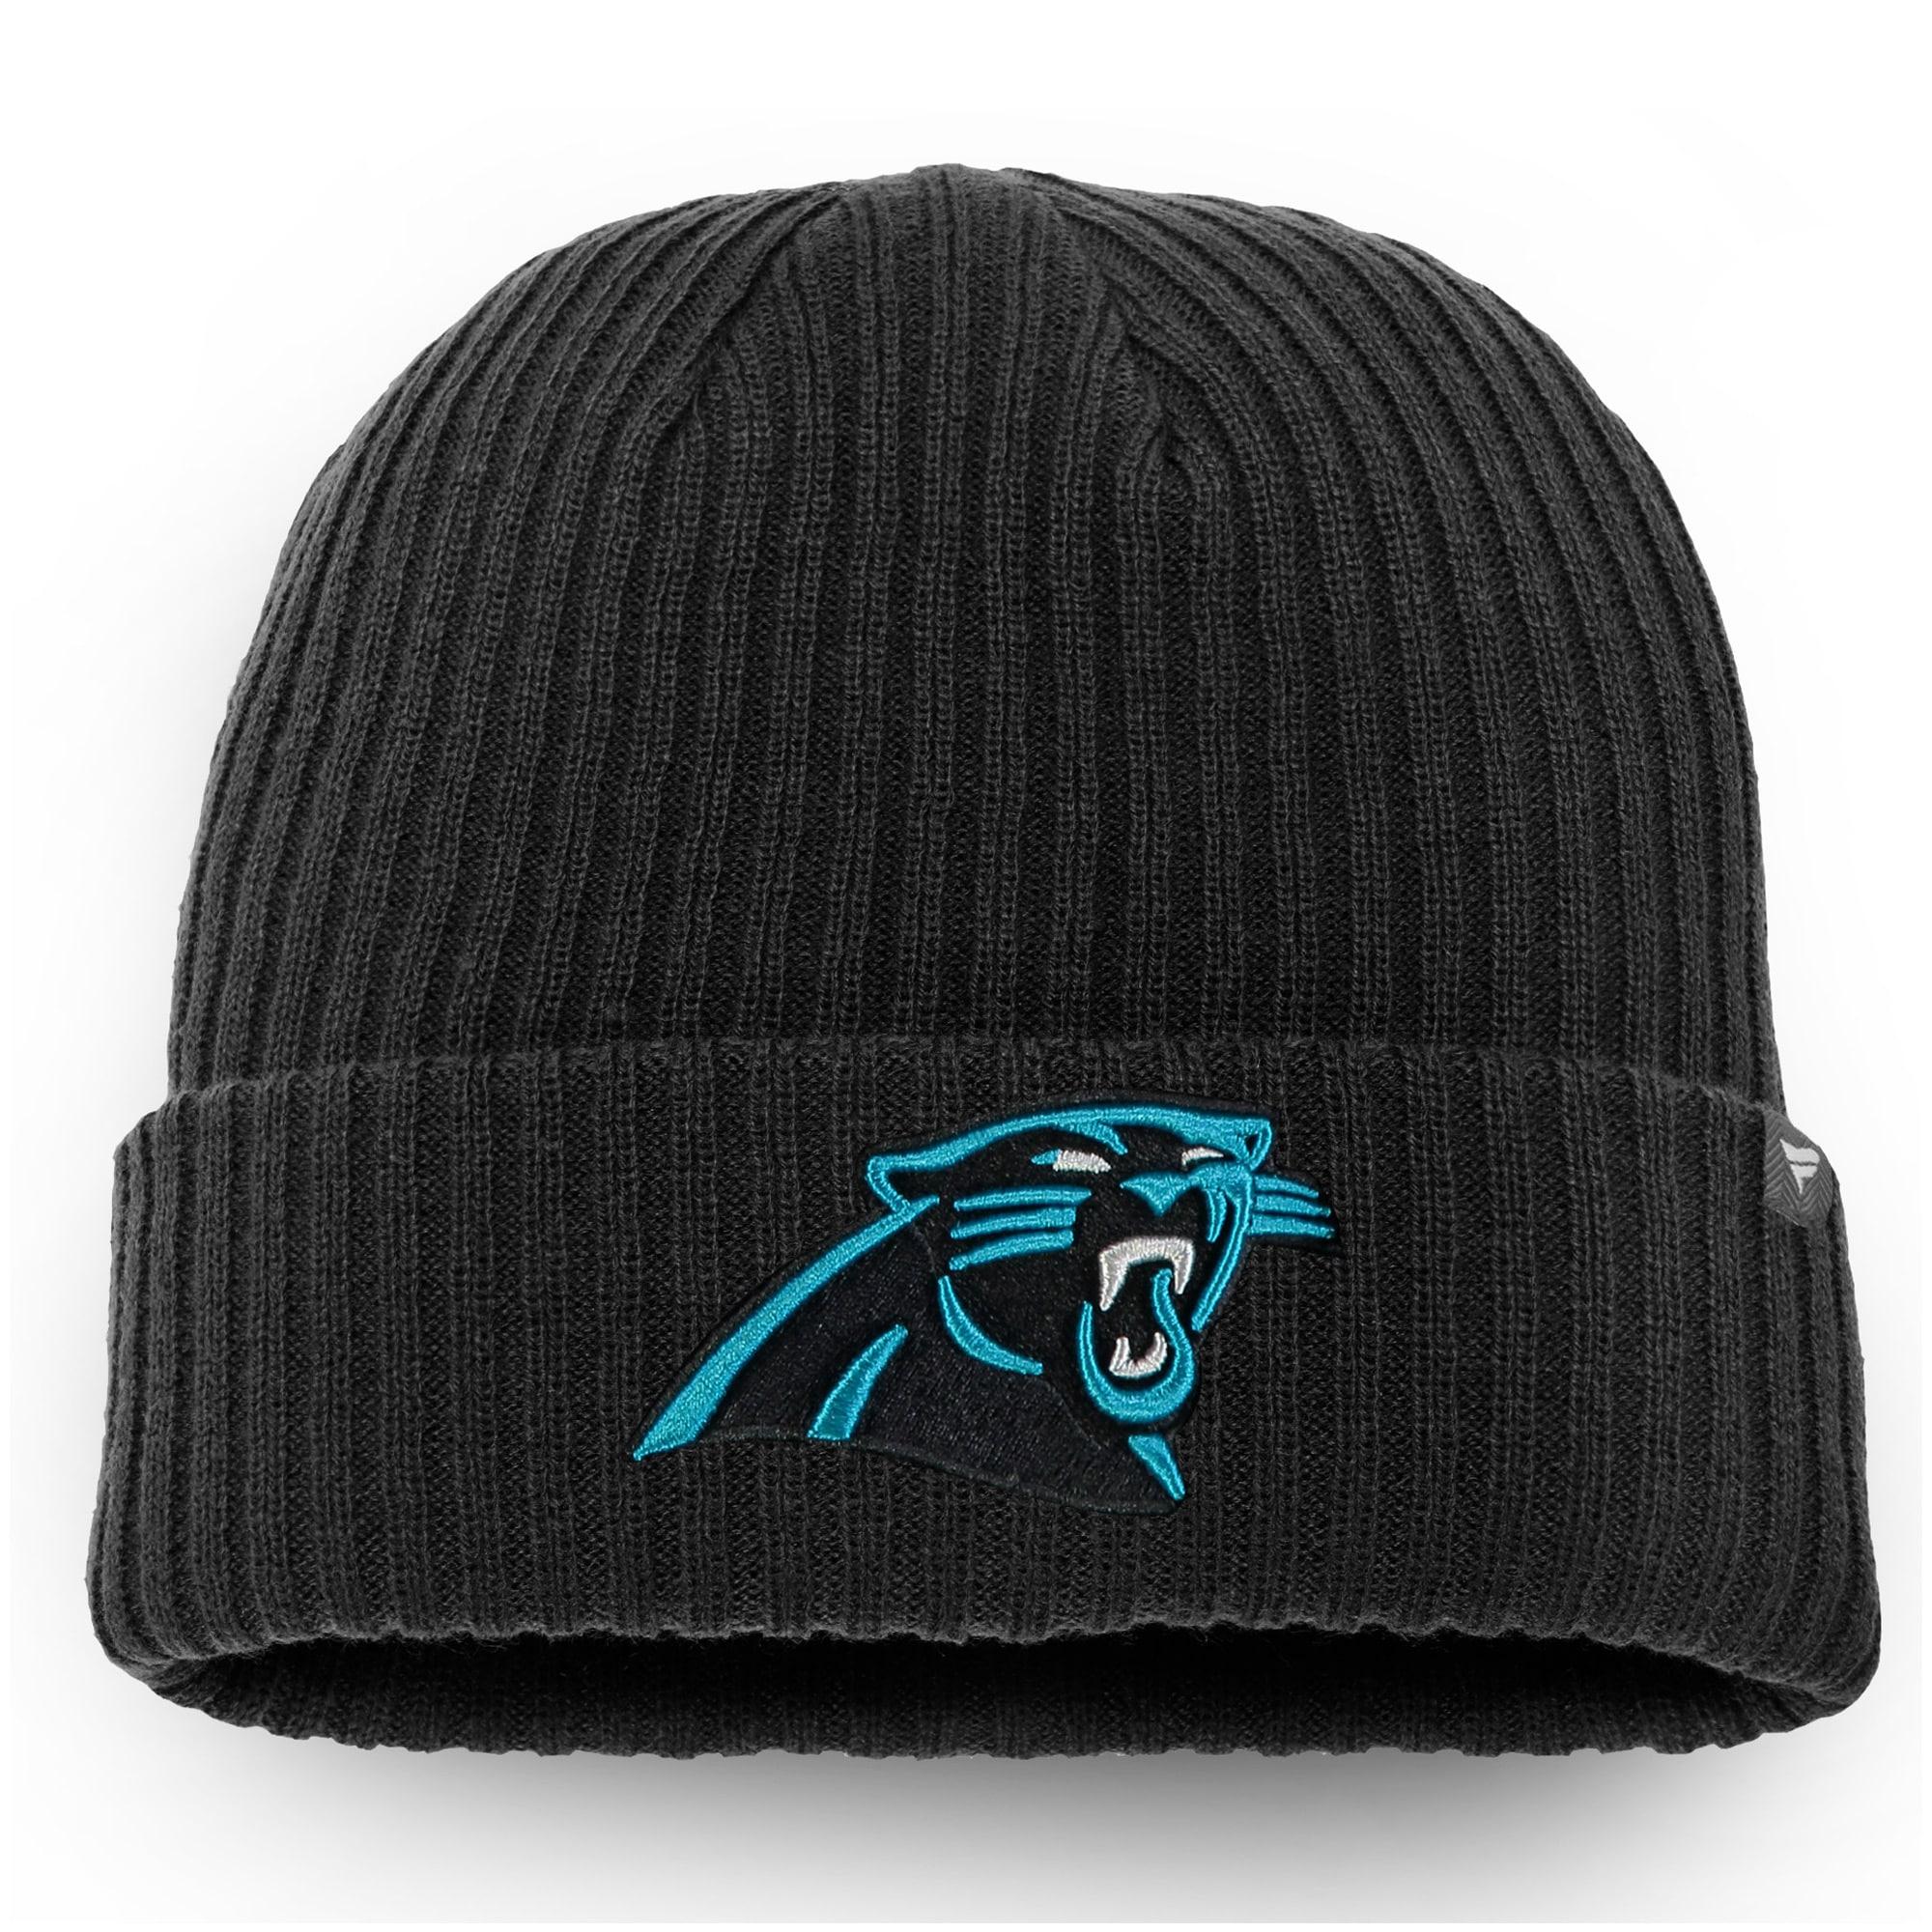 Carolina Panthers NFL Pro Line by Fanatics Branded Core Elevated II Cuffed Knit Hat - Black